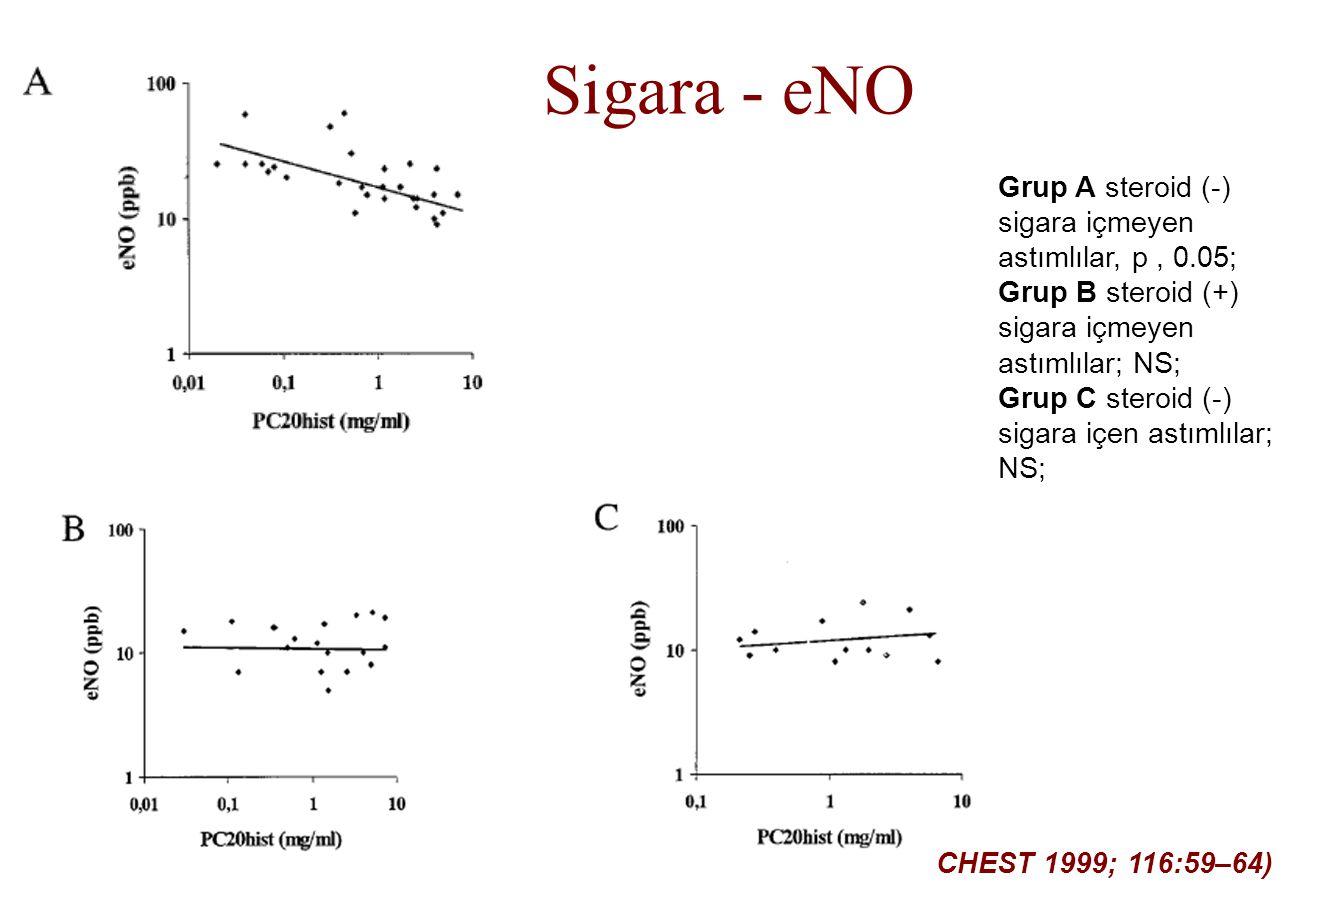 Sigara - eNO Grup A steroid (-) sigara içmeyen astımlılar, p , 0.05;